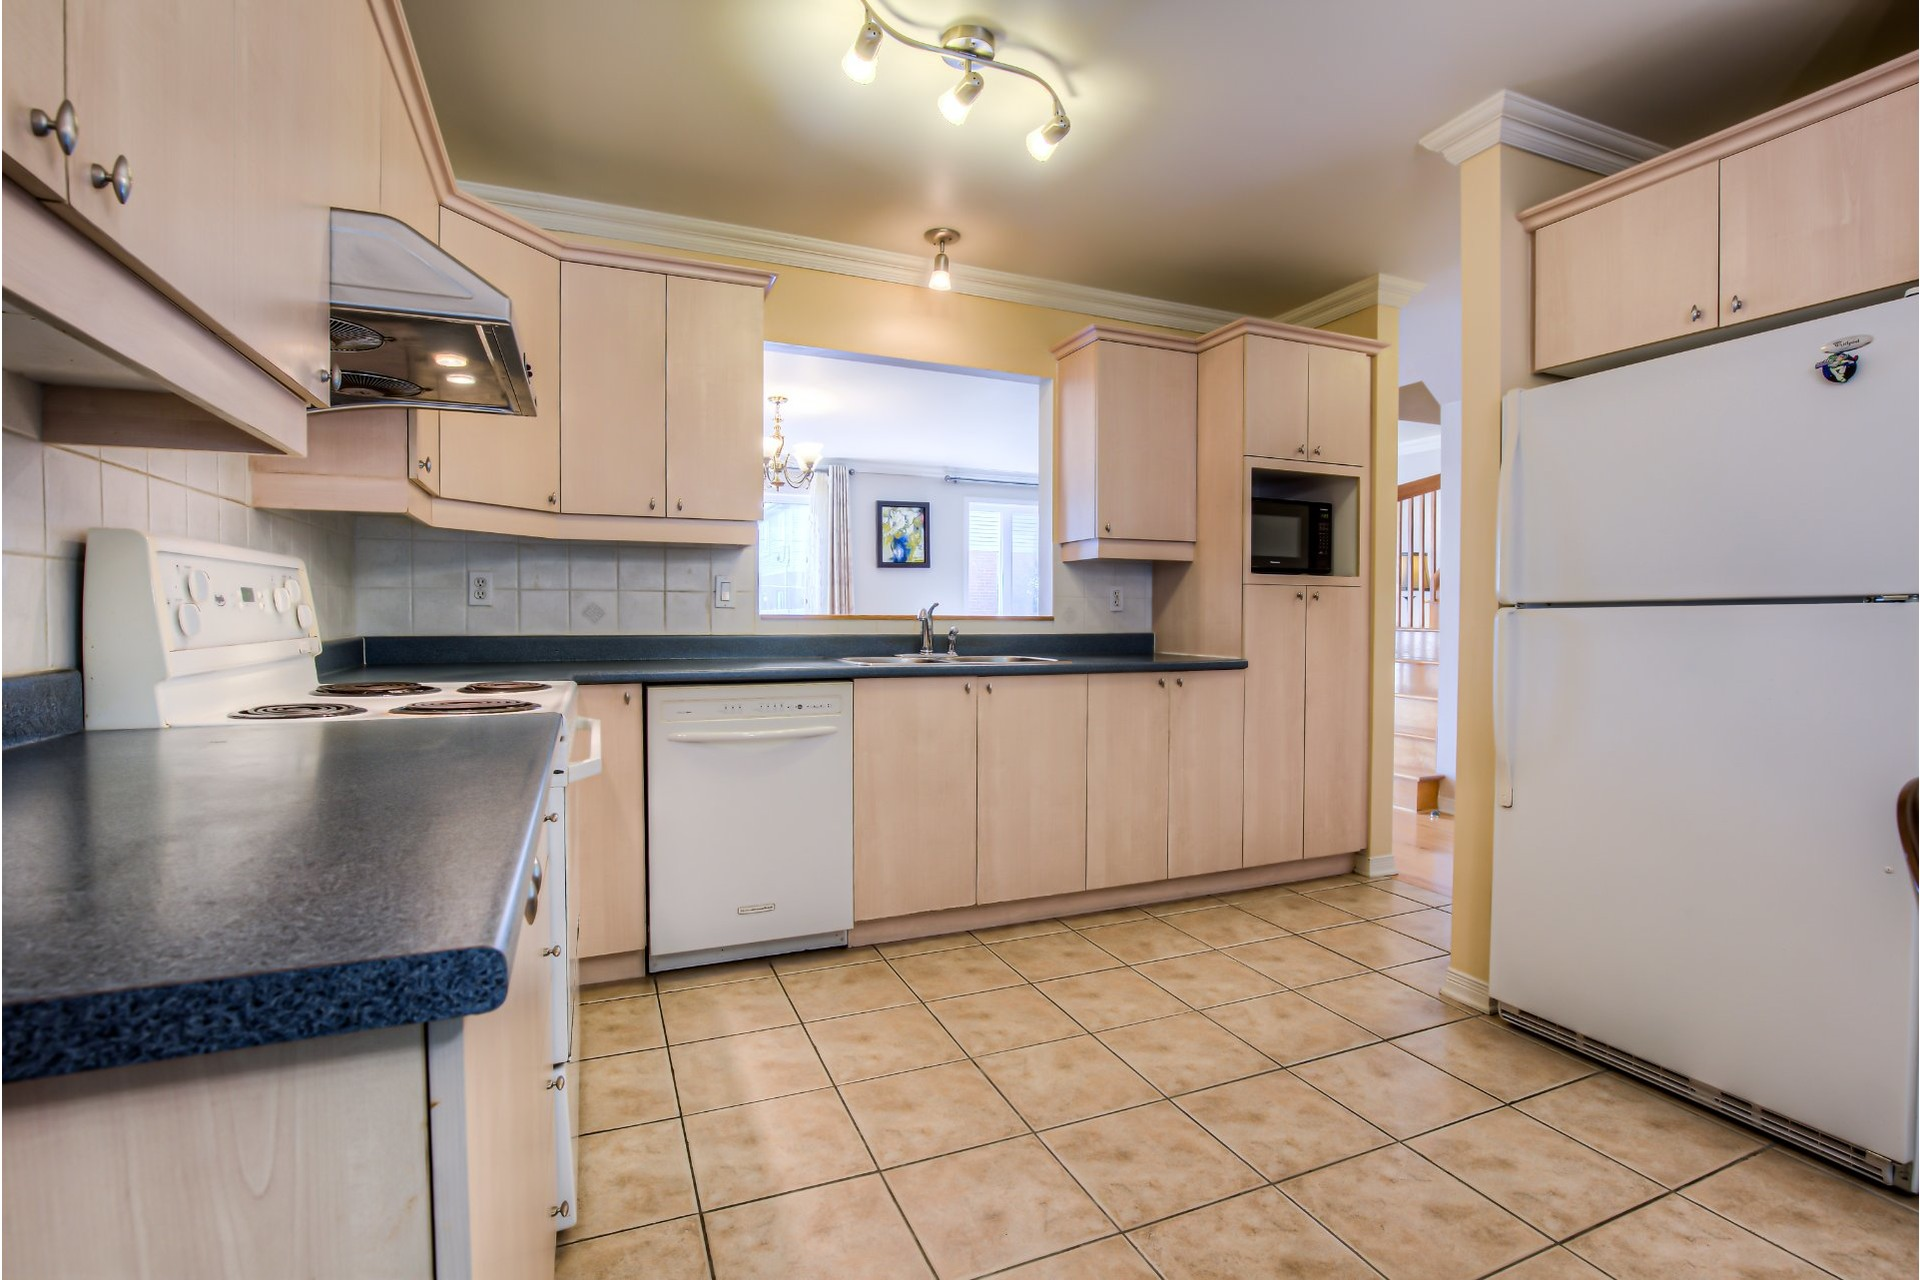 image 8 - 屋 出售 Pierrefonds-Roxboro Montréal  - 8 室